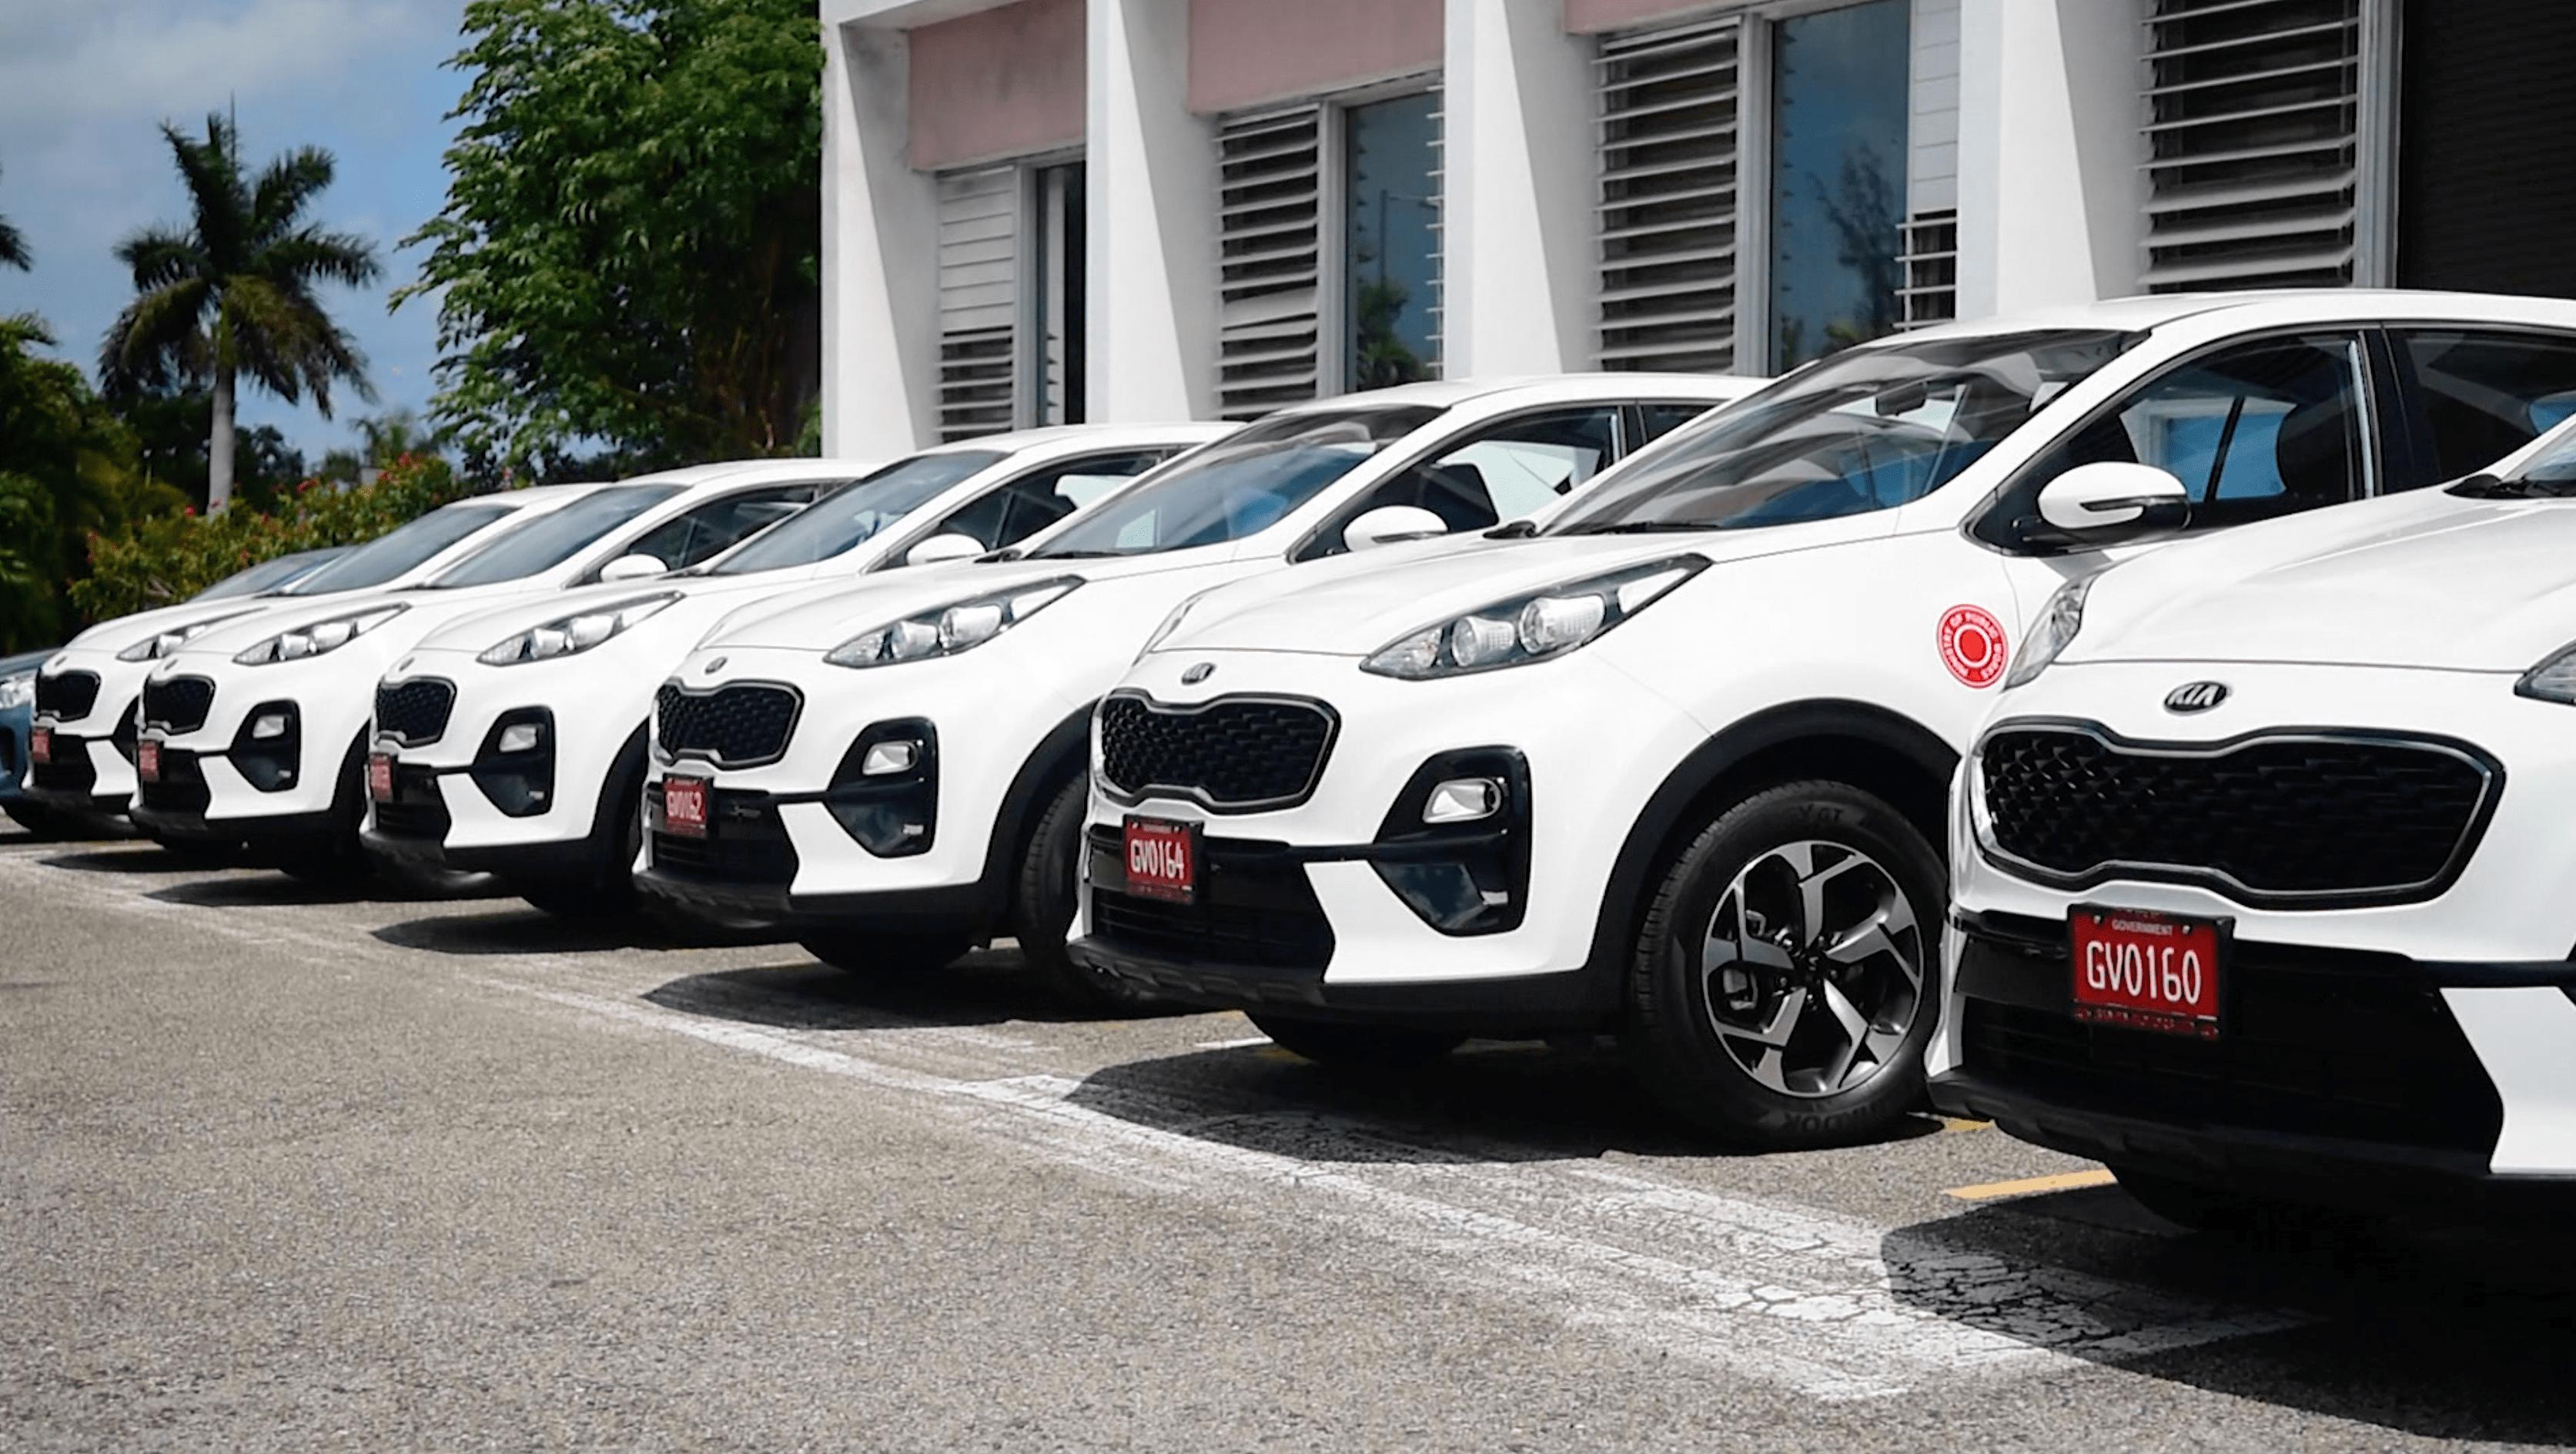 New fleet of vehicles to improve efficiency of Public Works